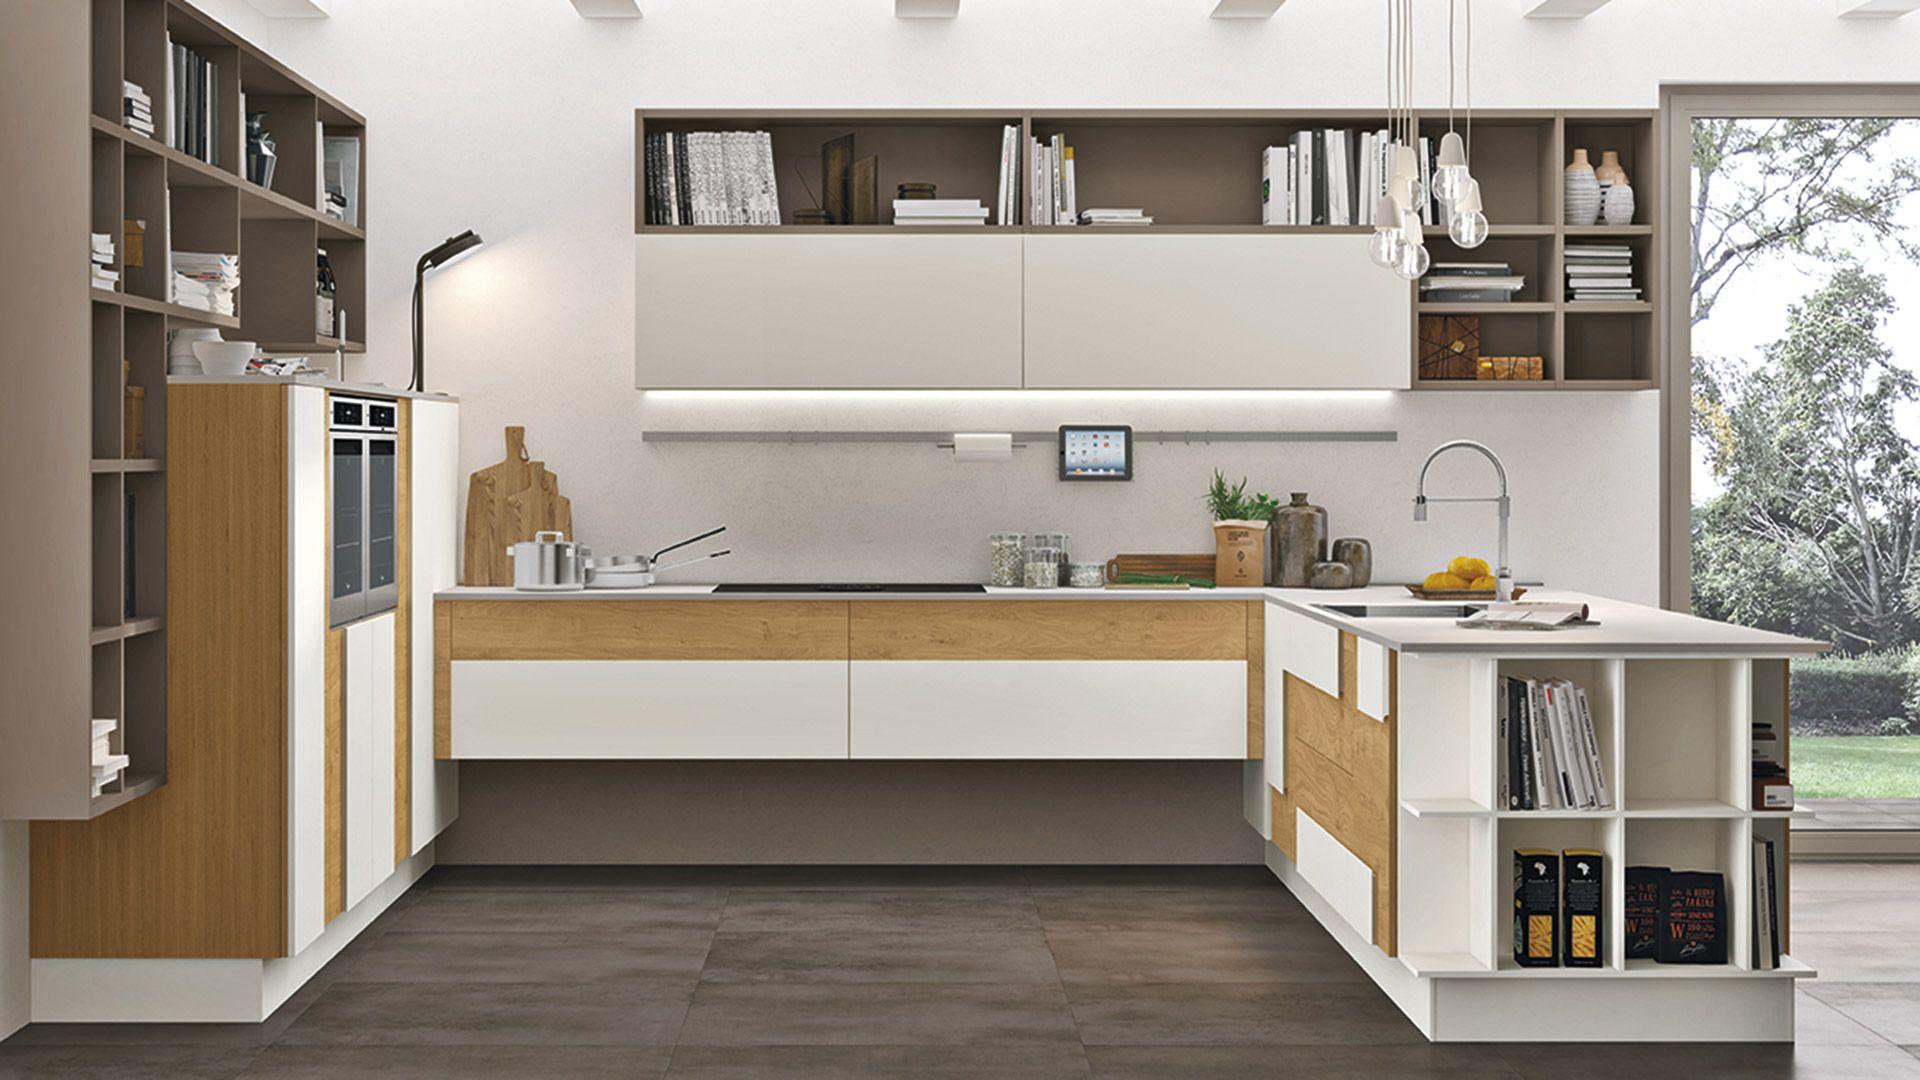 Cucine Open Space Moderne creativa - cucine moderne - cucine lube | Кухня открытого